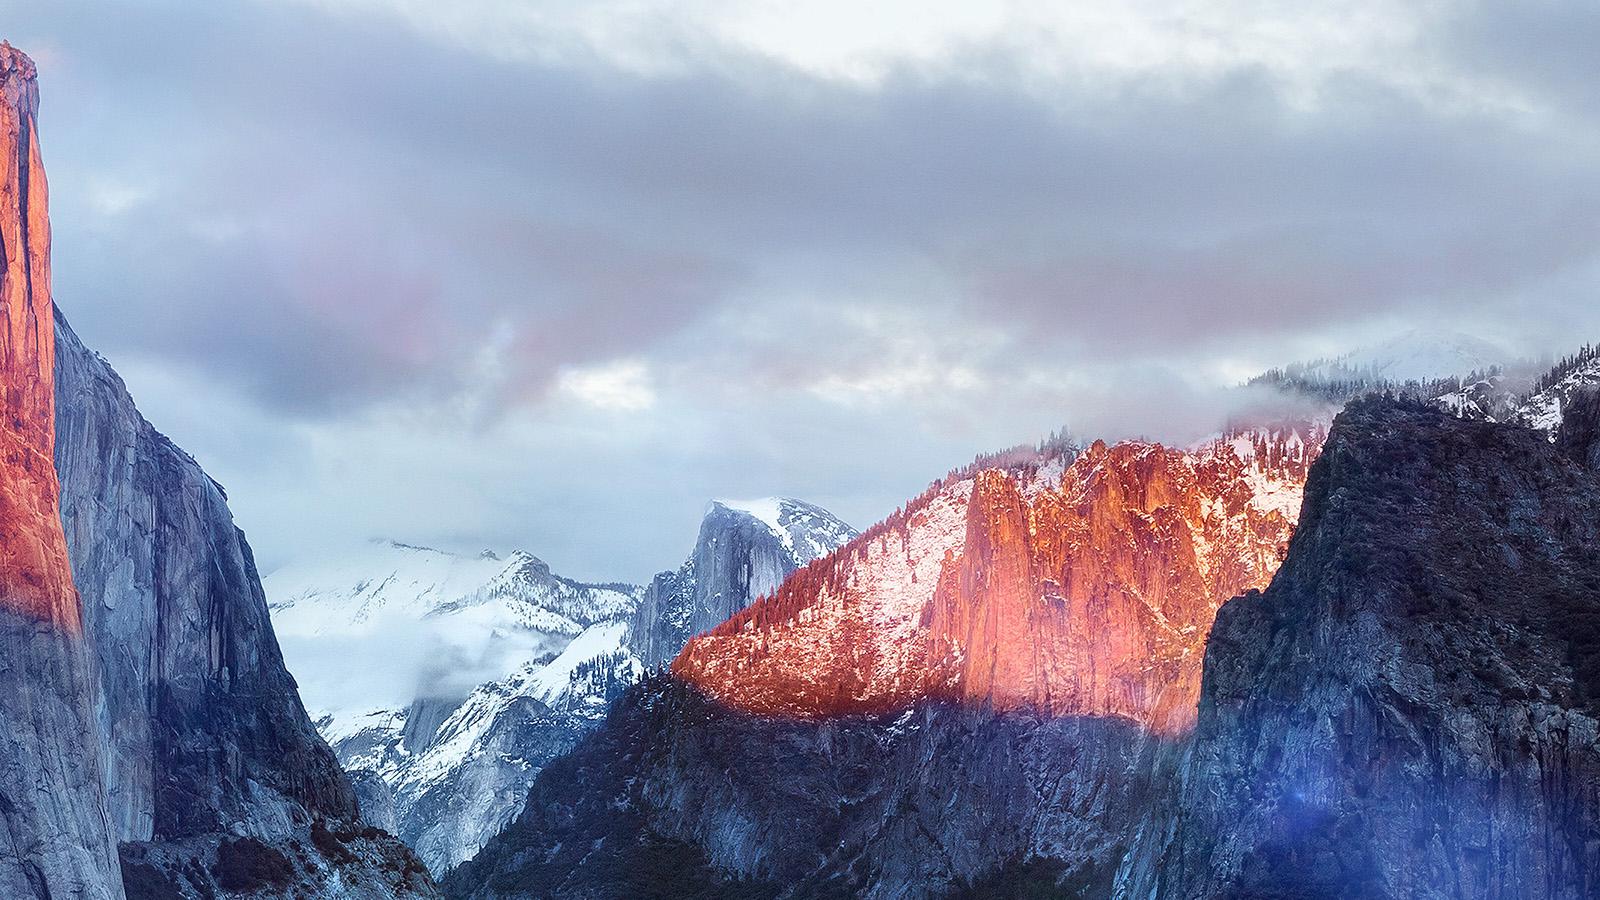 mac wallpaper 4k,mountainous landforms,mountain,mountain range,sky,nature